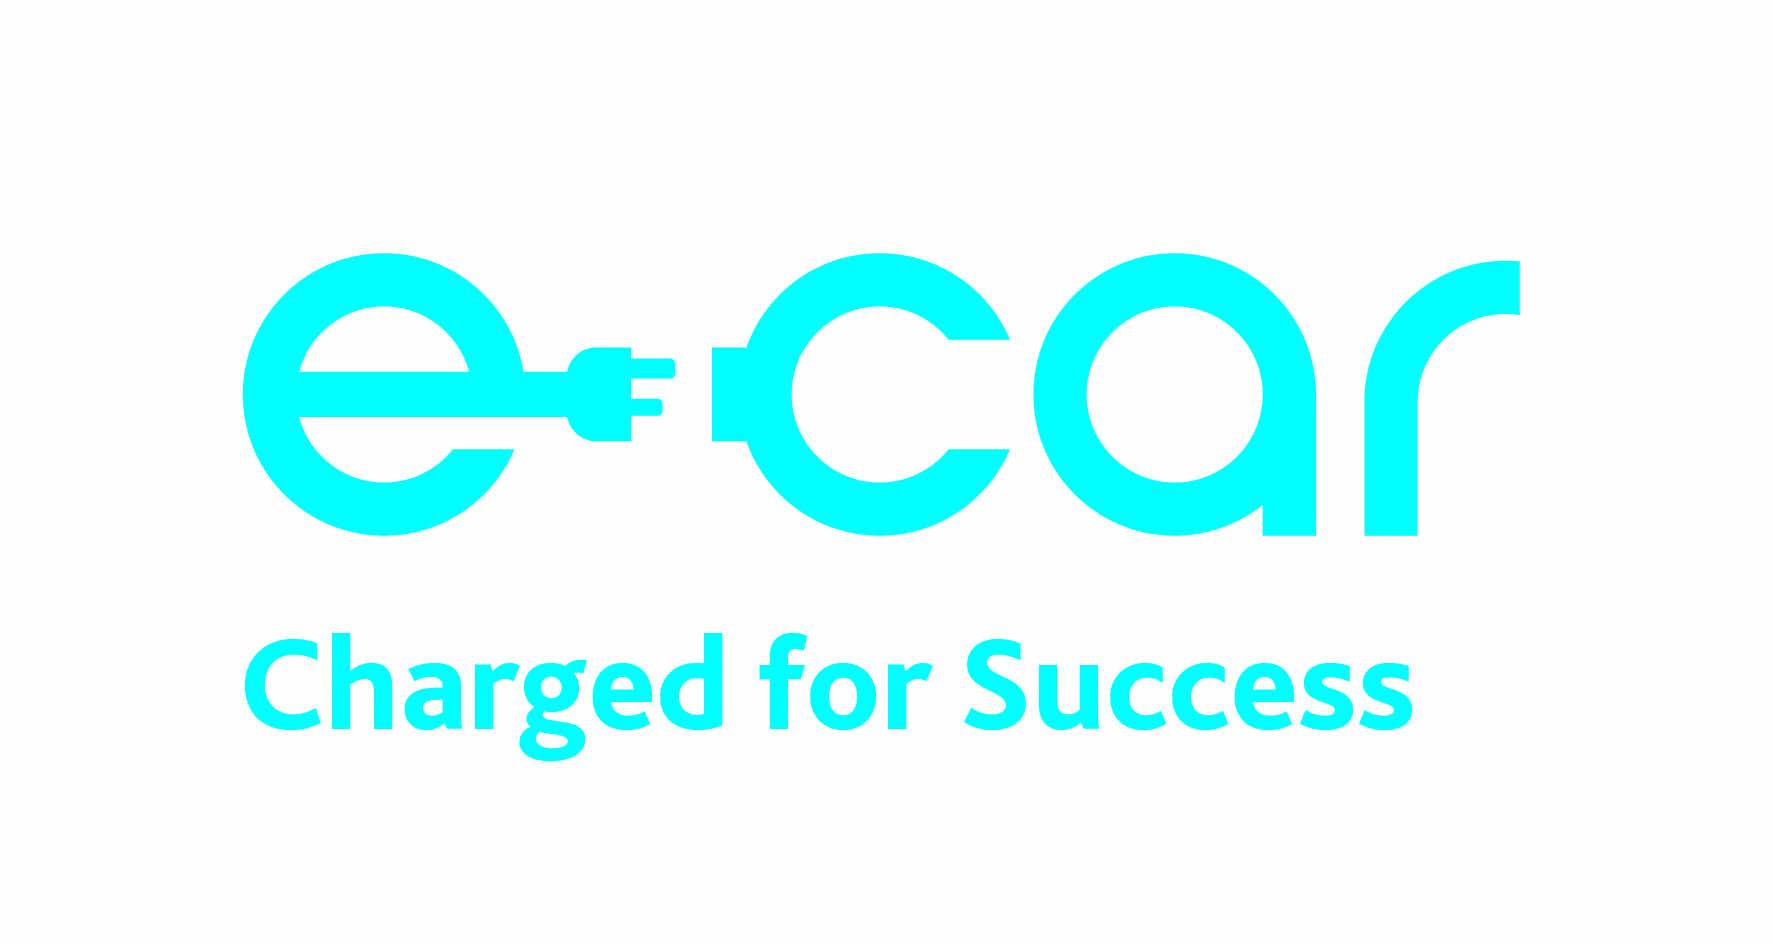 Electric Cars Ecarni Strategic Investment Board